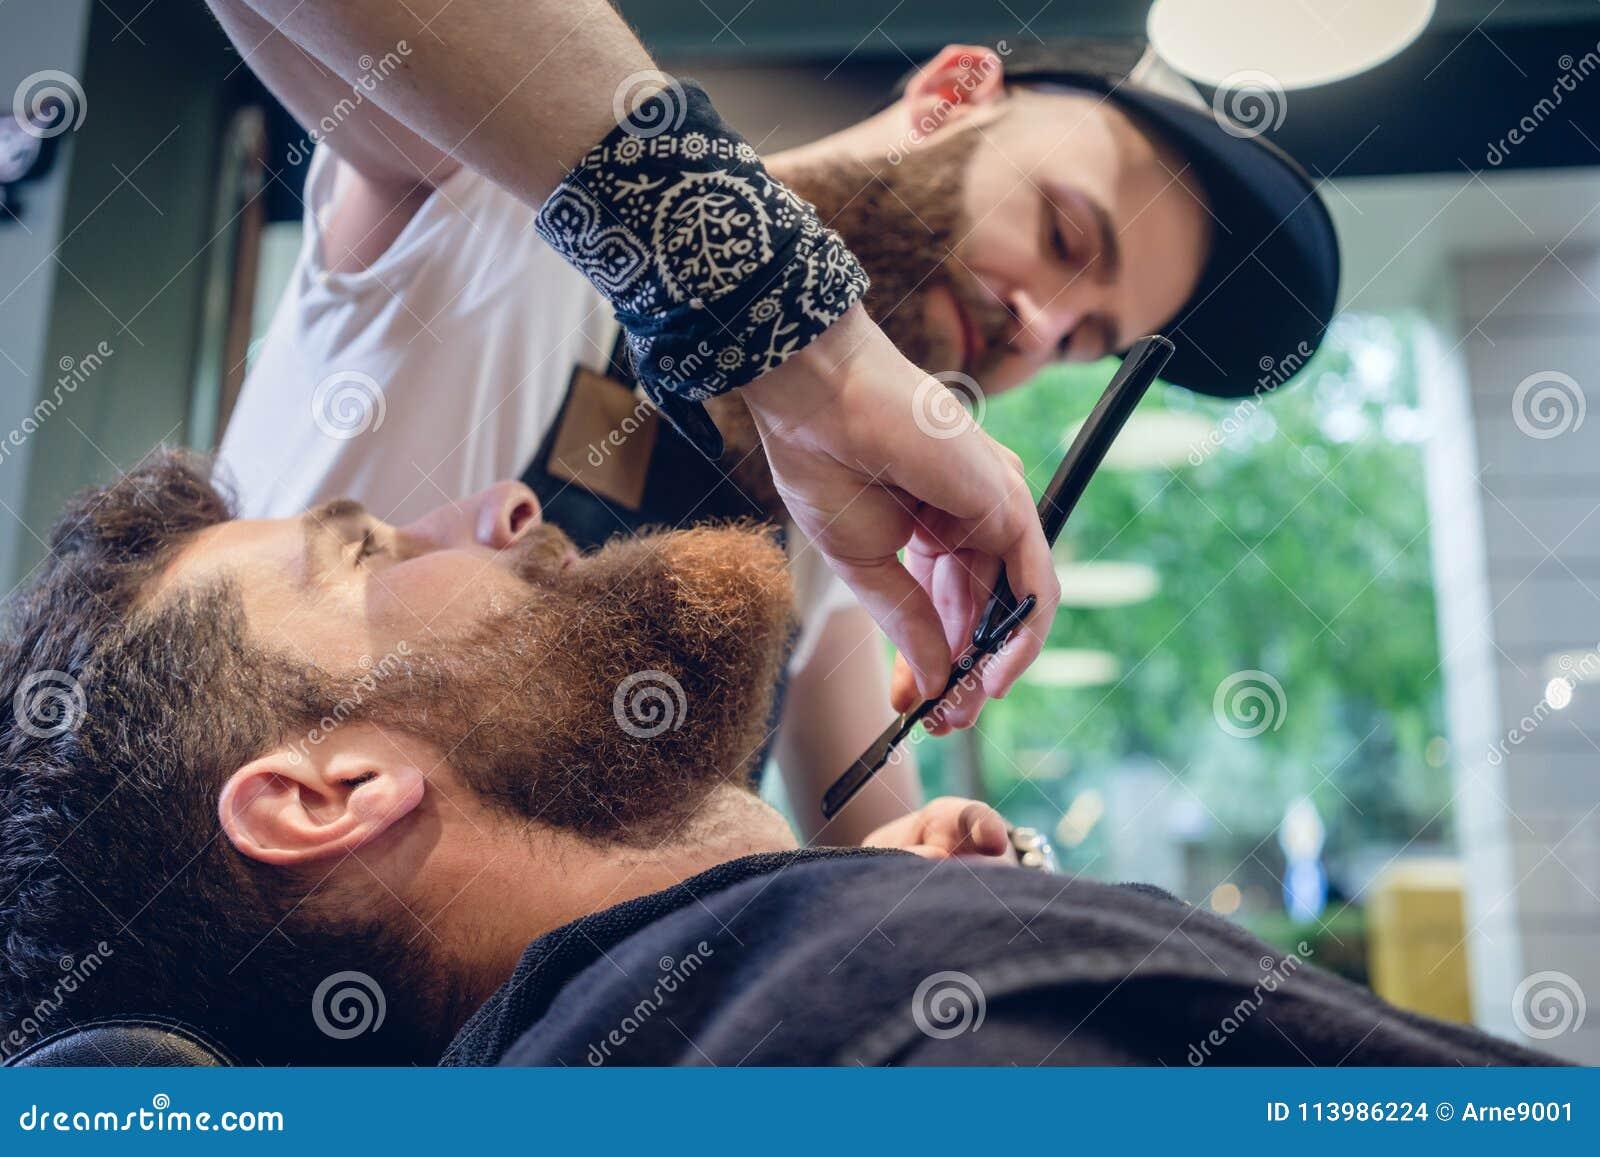 Bärtiger junger Mann bereit zum Rasieren im Friseursalon eines erfahrenen Friseurs